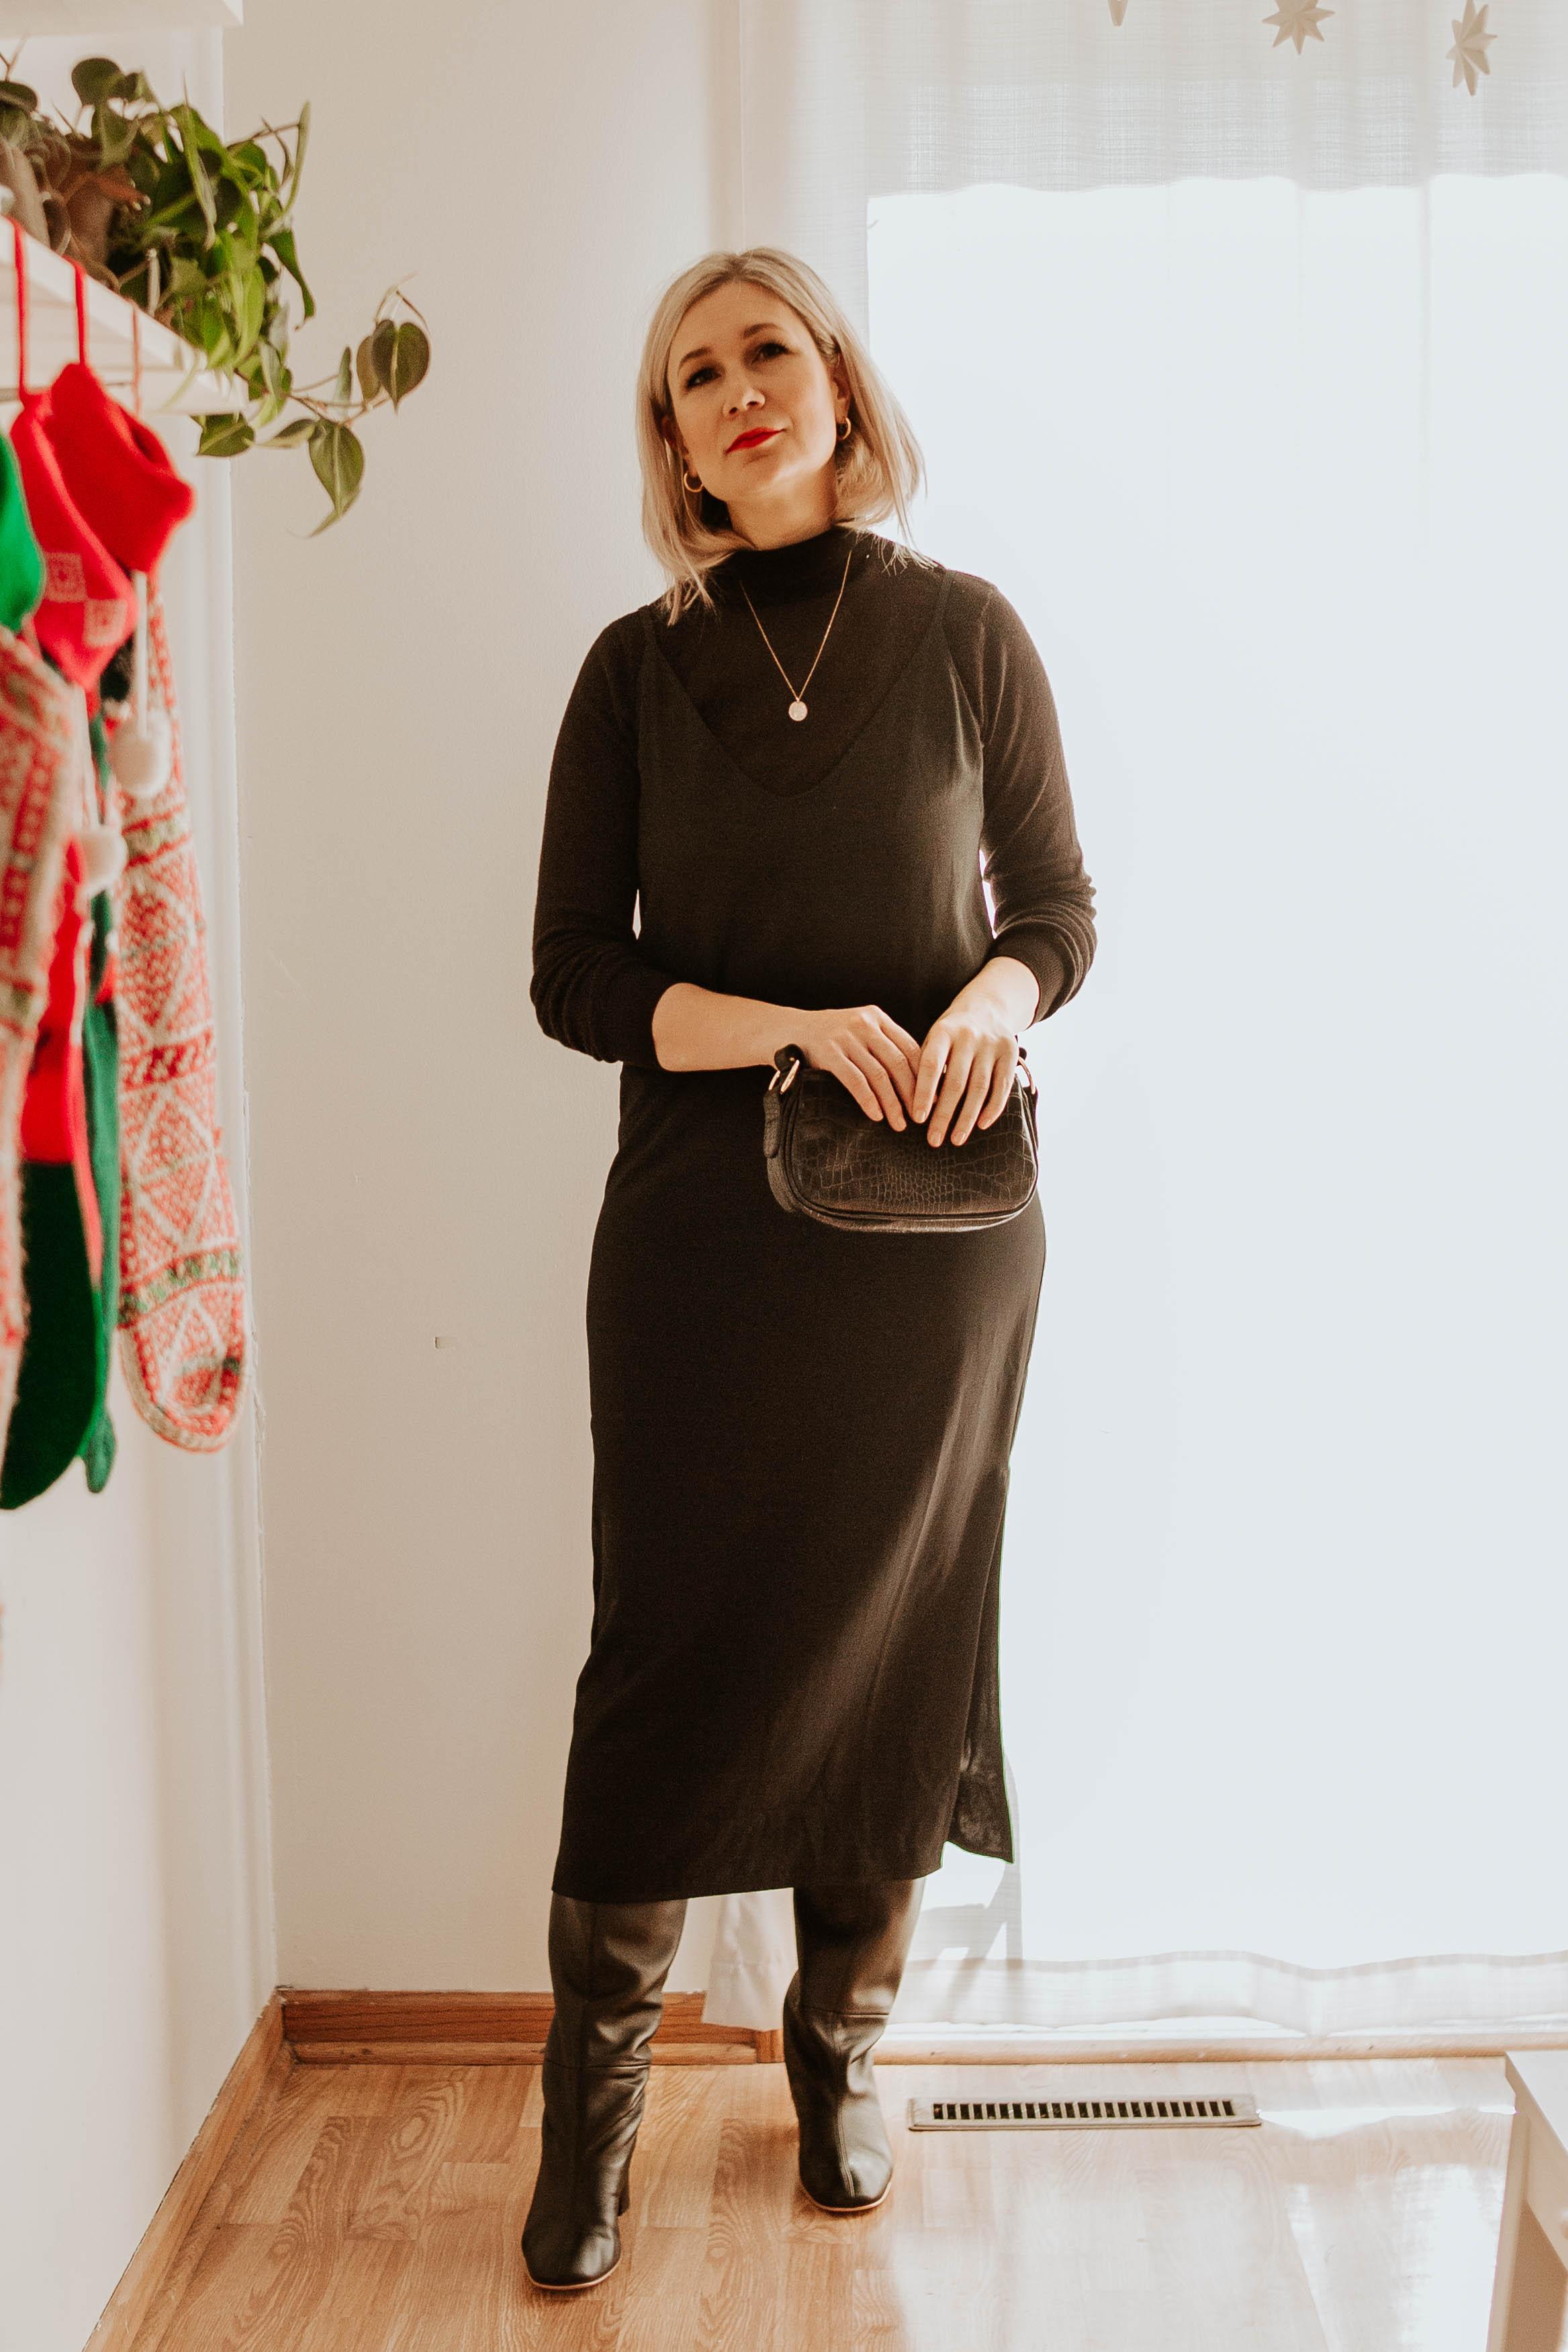 Mini Holiday Lookbook Featuring Ethical Fashion, black turtleneck sweater, everlane slip dress, black knee high boots, everlane knee high boots, mini croc bag